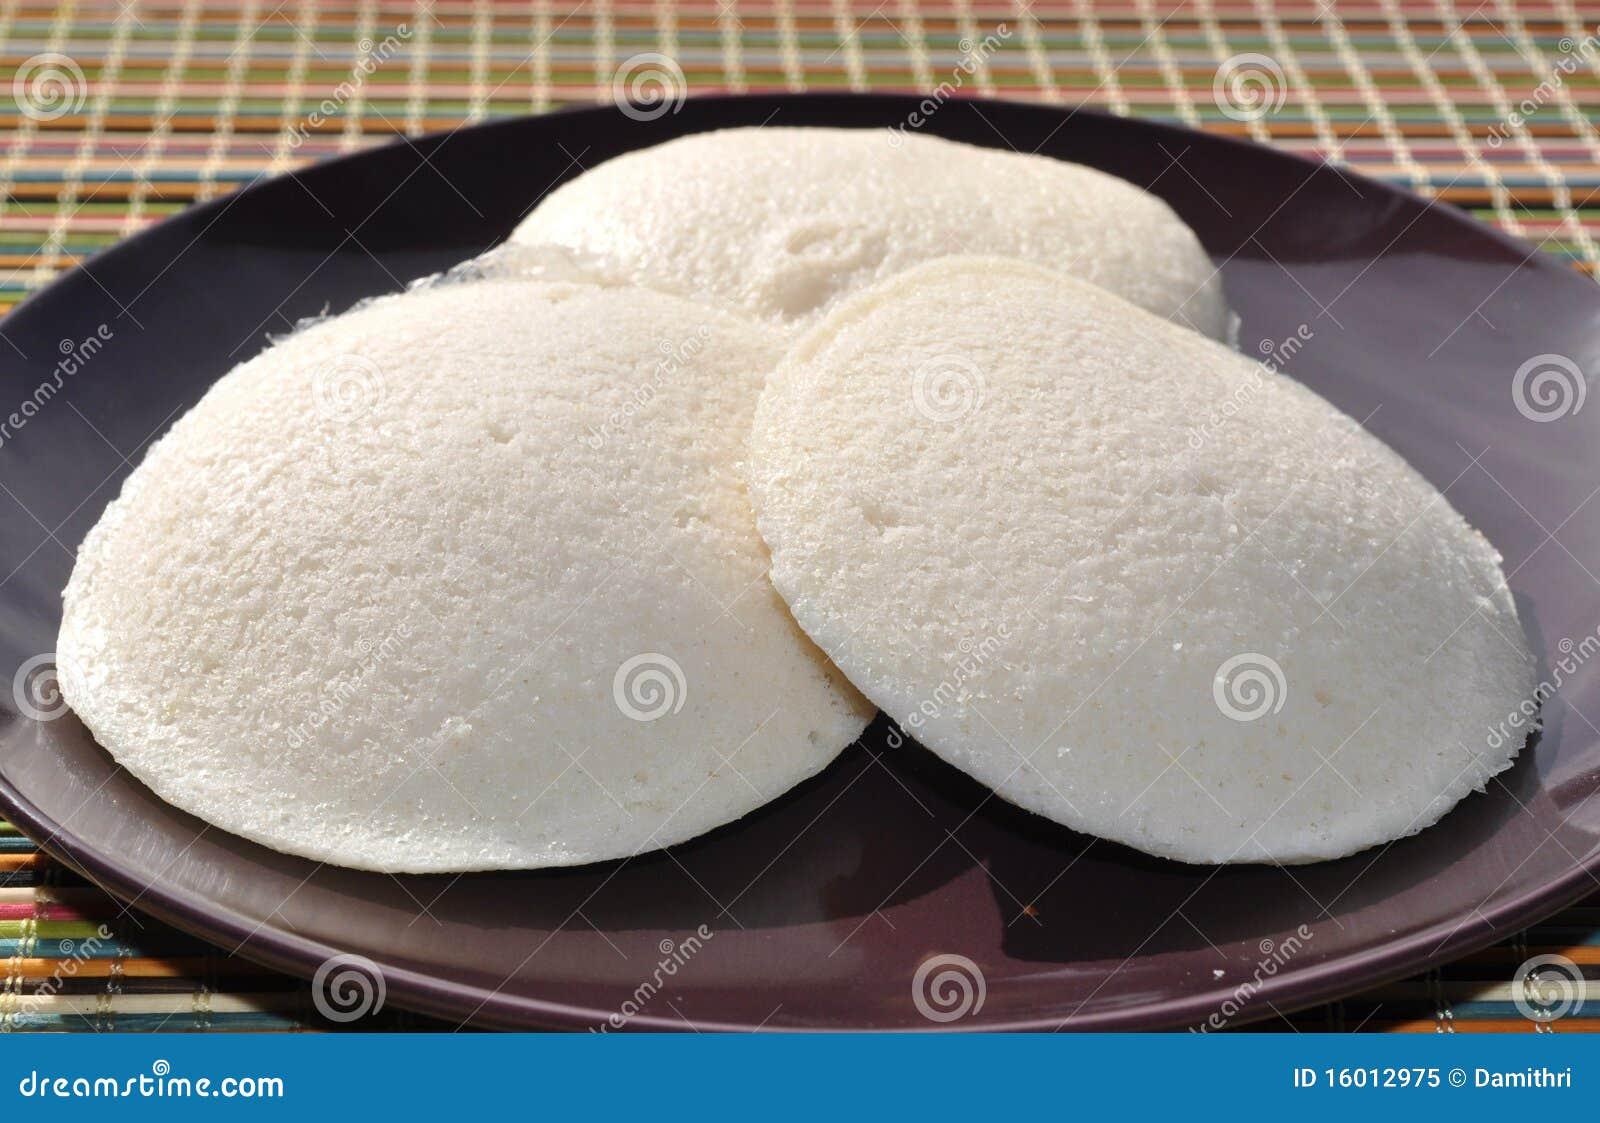 how to make sambar rice in tamil language